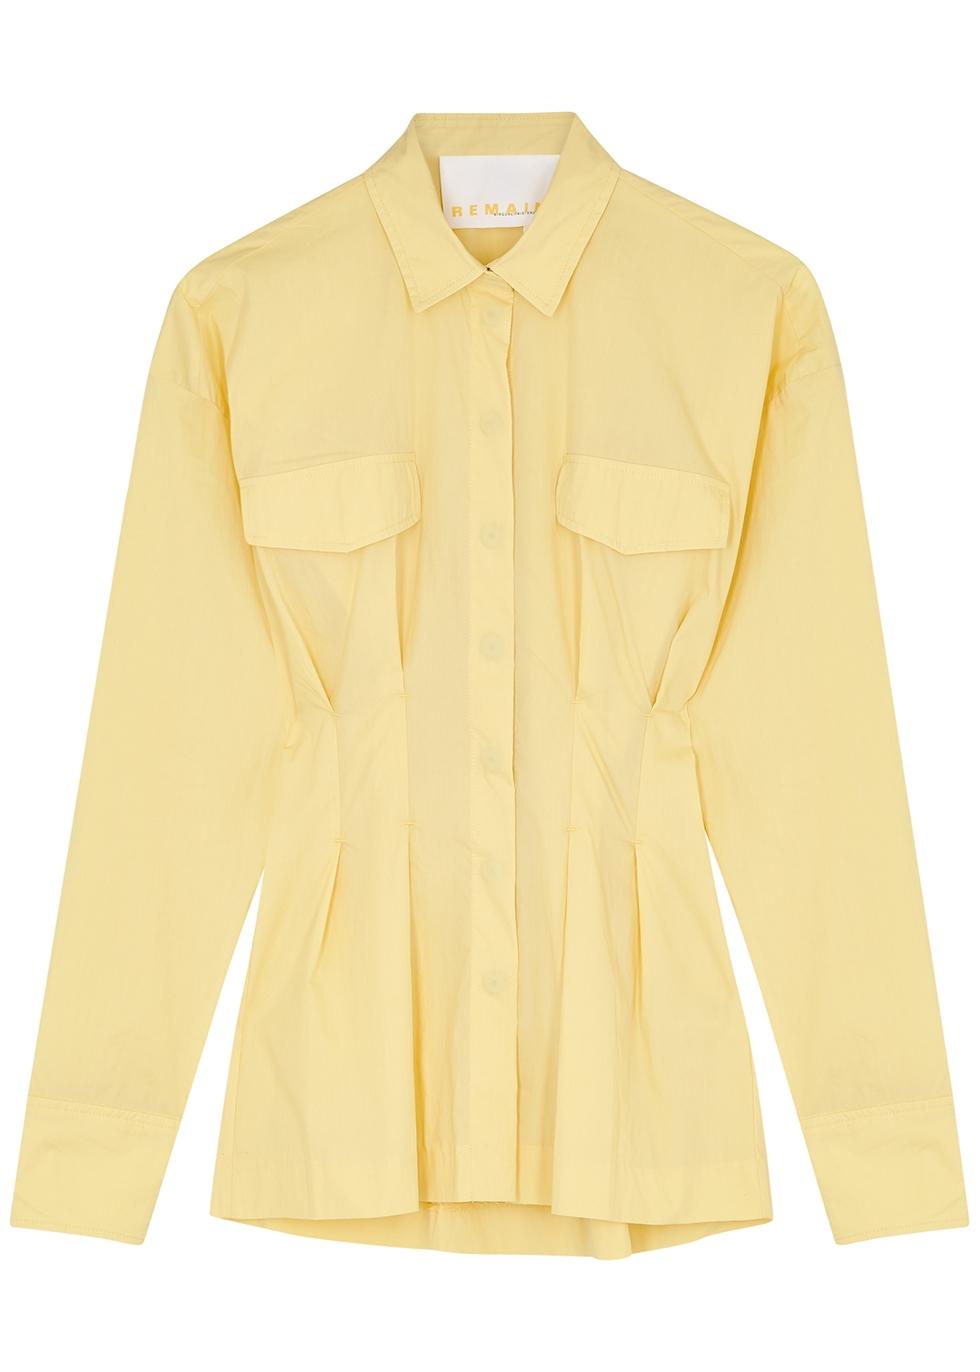 Charlotte yellow taffeta shirt